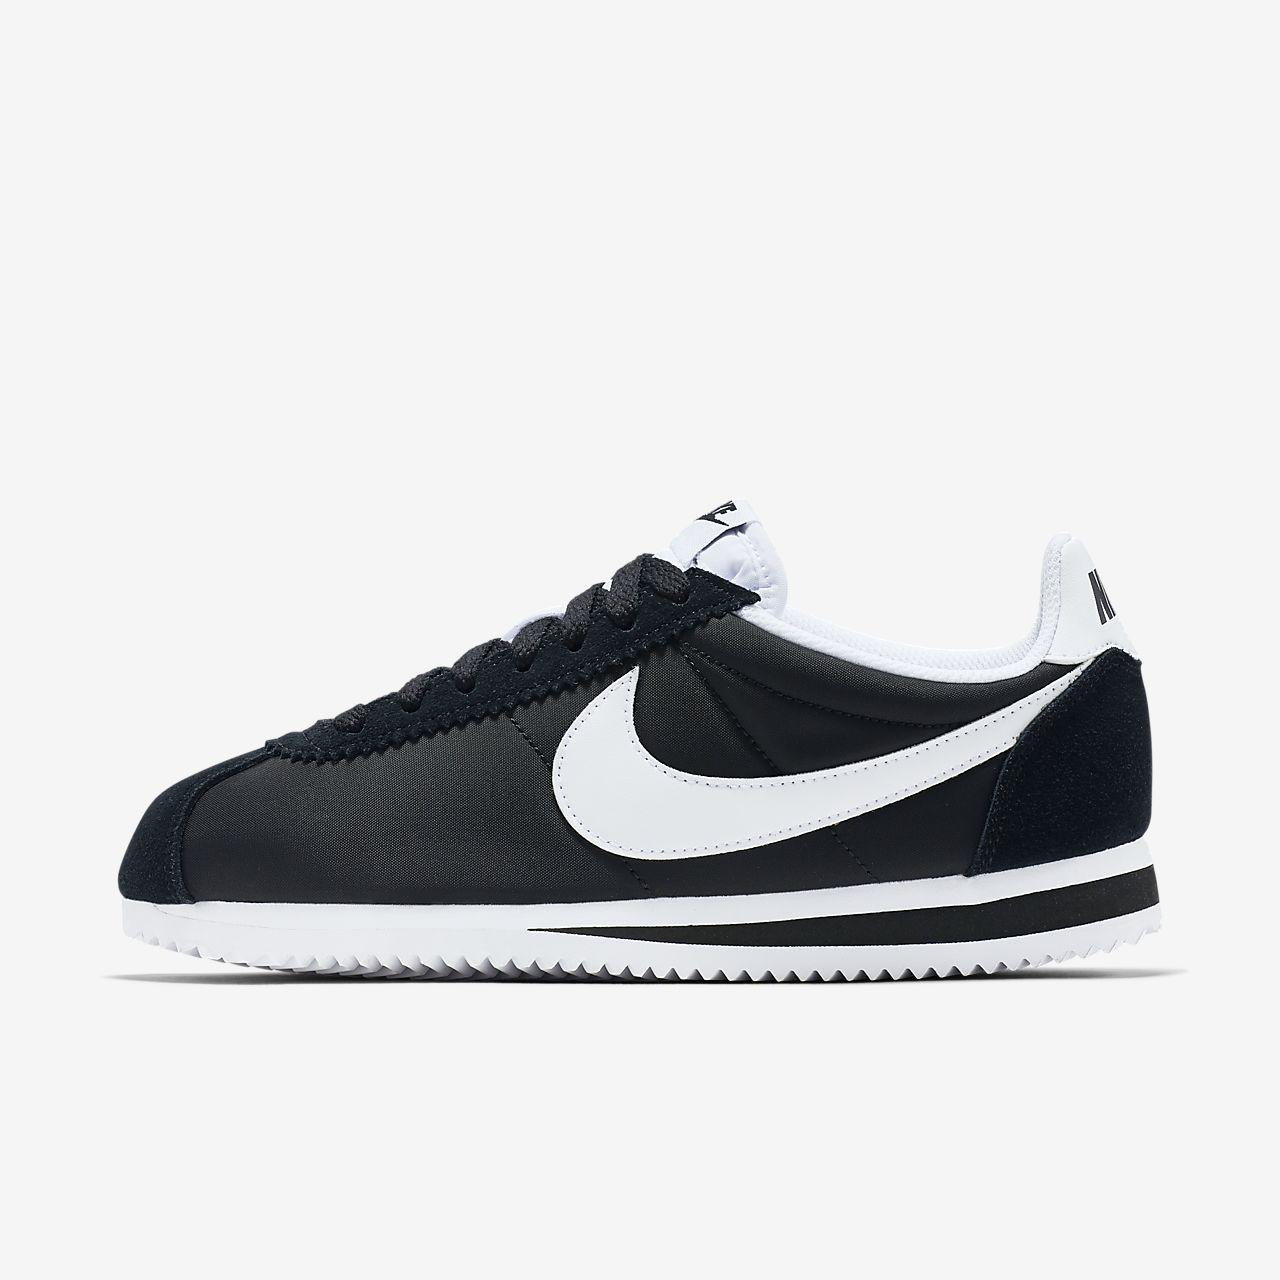 timeless design 55e29 4f442 ... Chaussure Nike Classic Cortez Nylon pour Femme